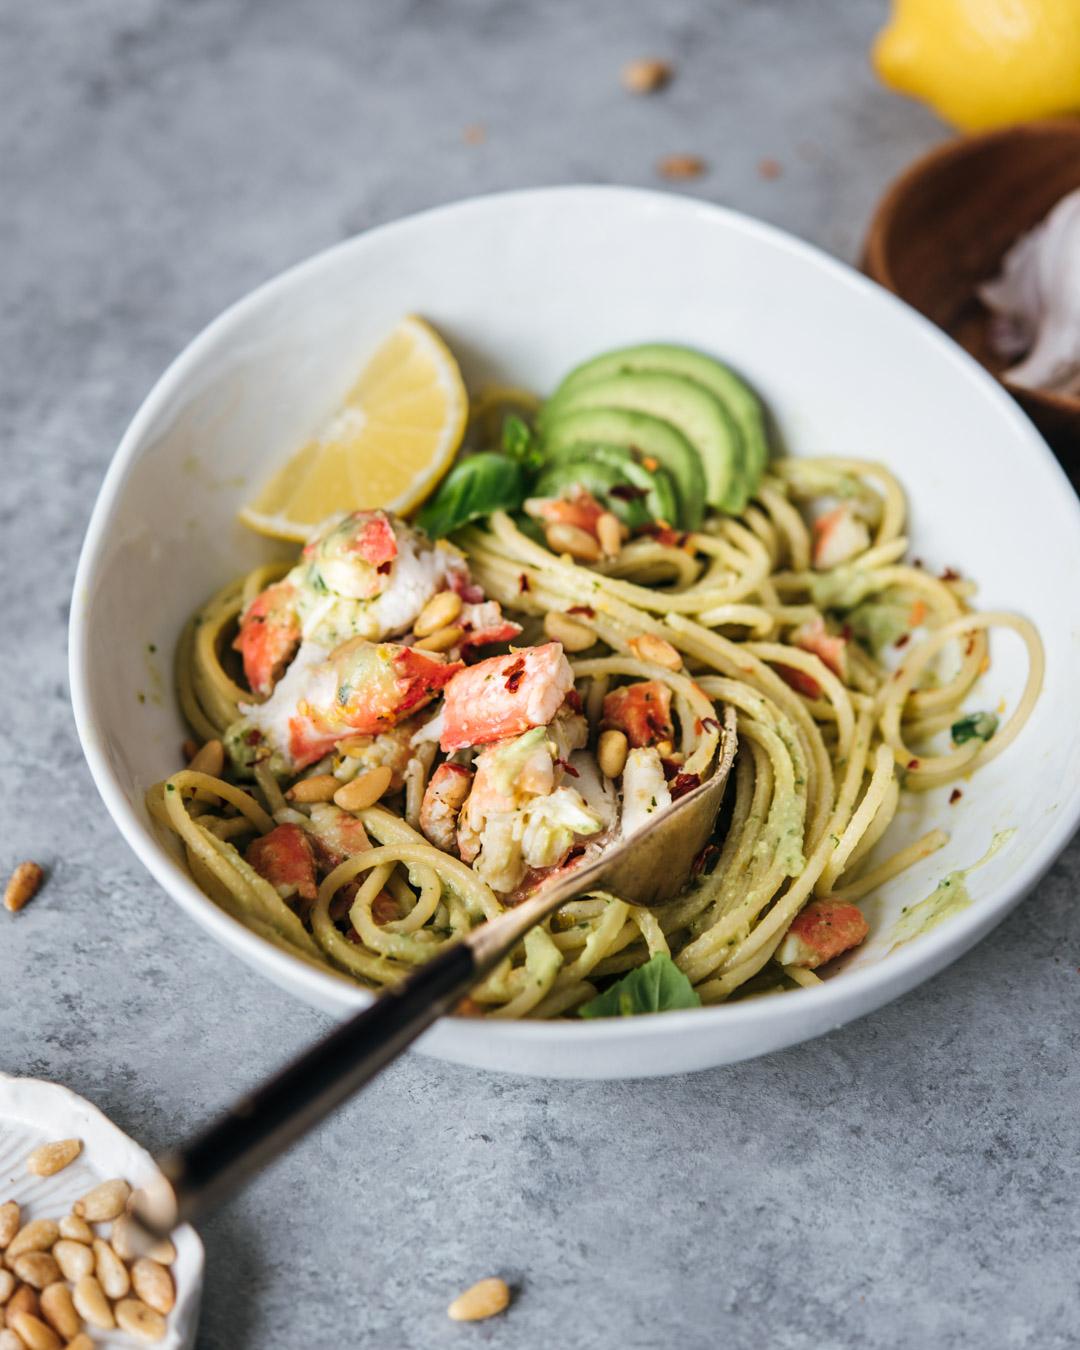 king crab avocado pesto pasta petrossian-0026-2.jpg